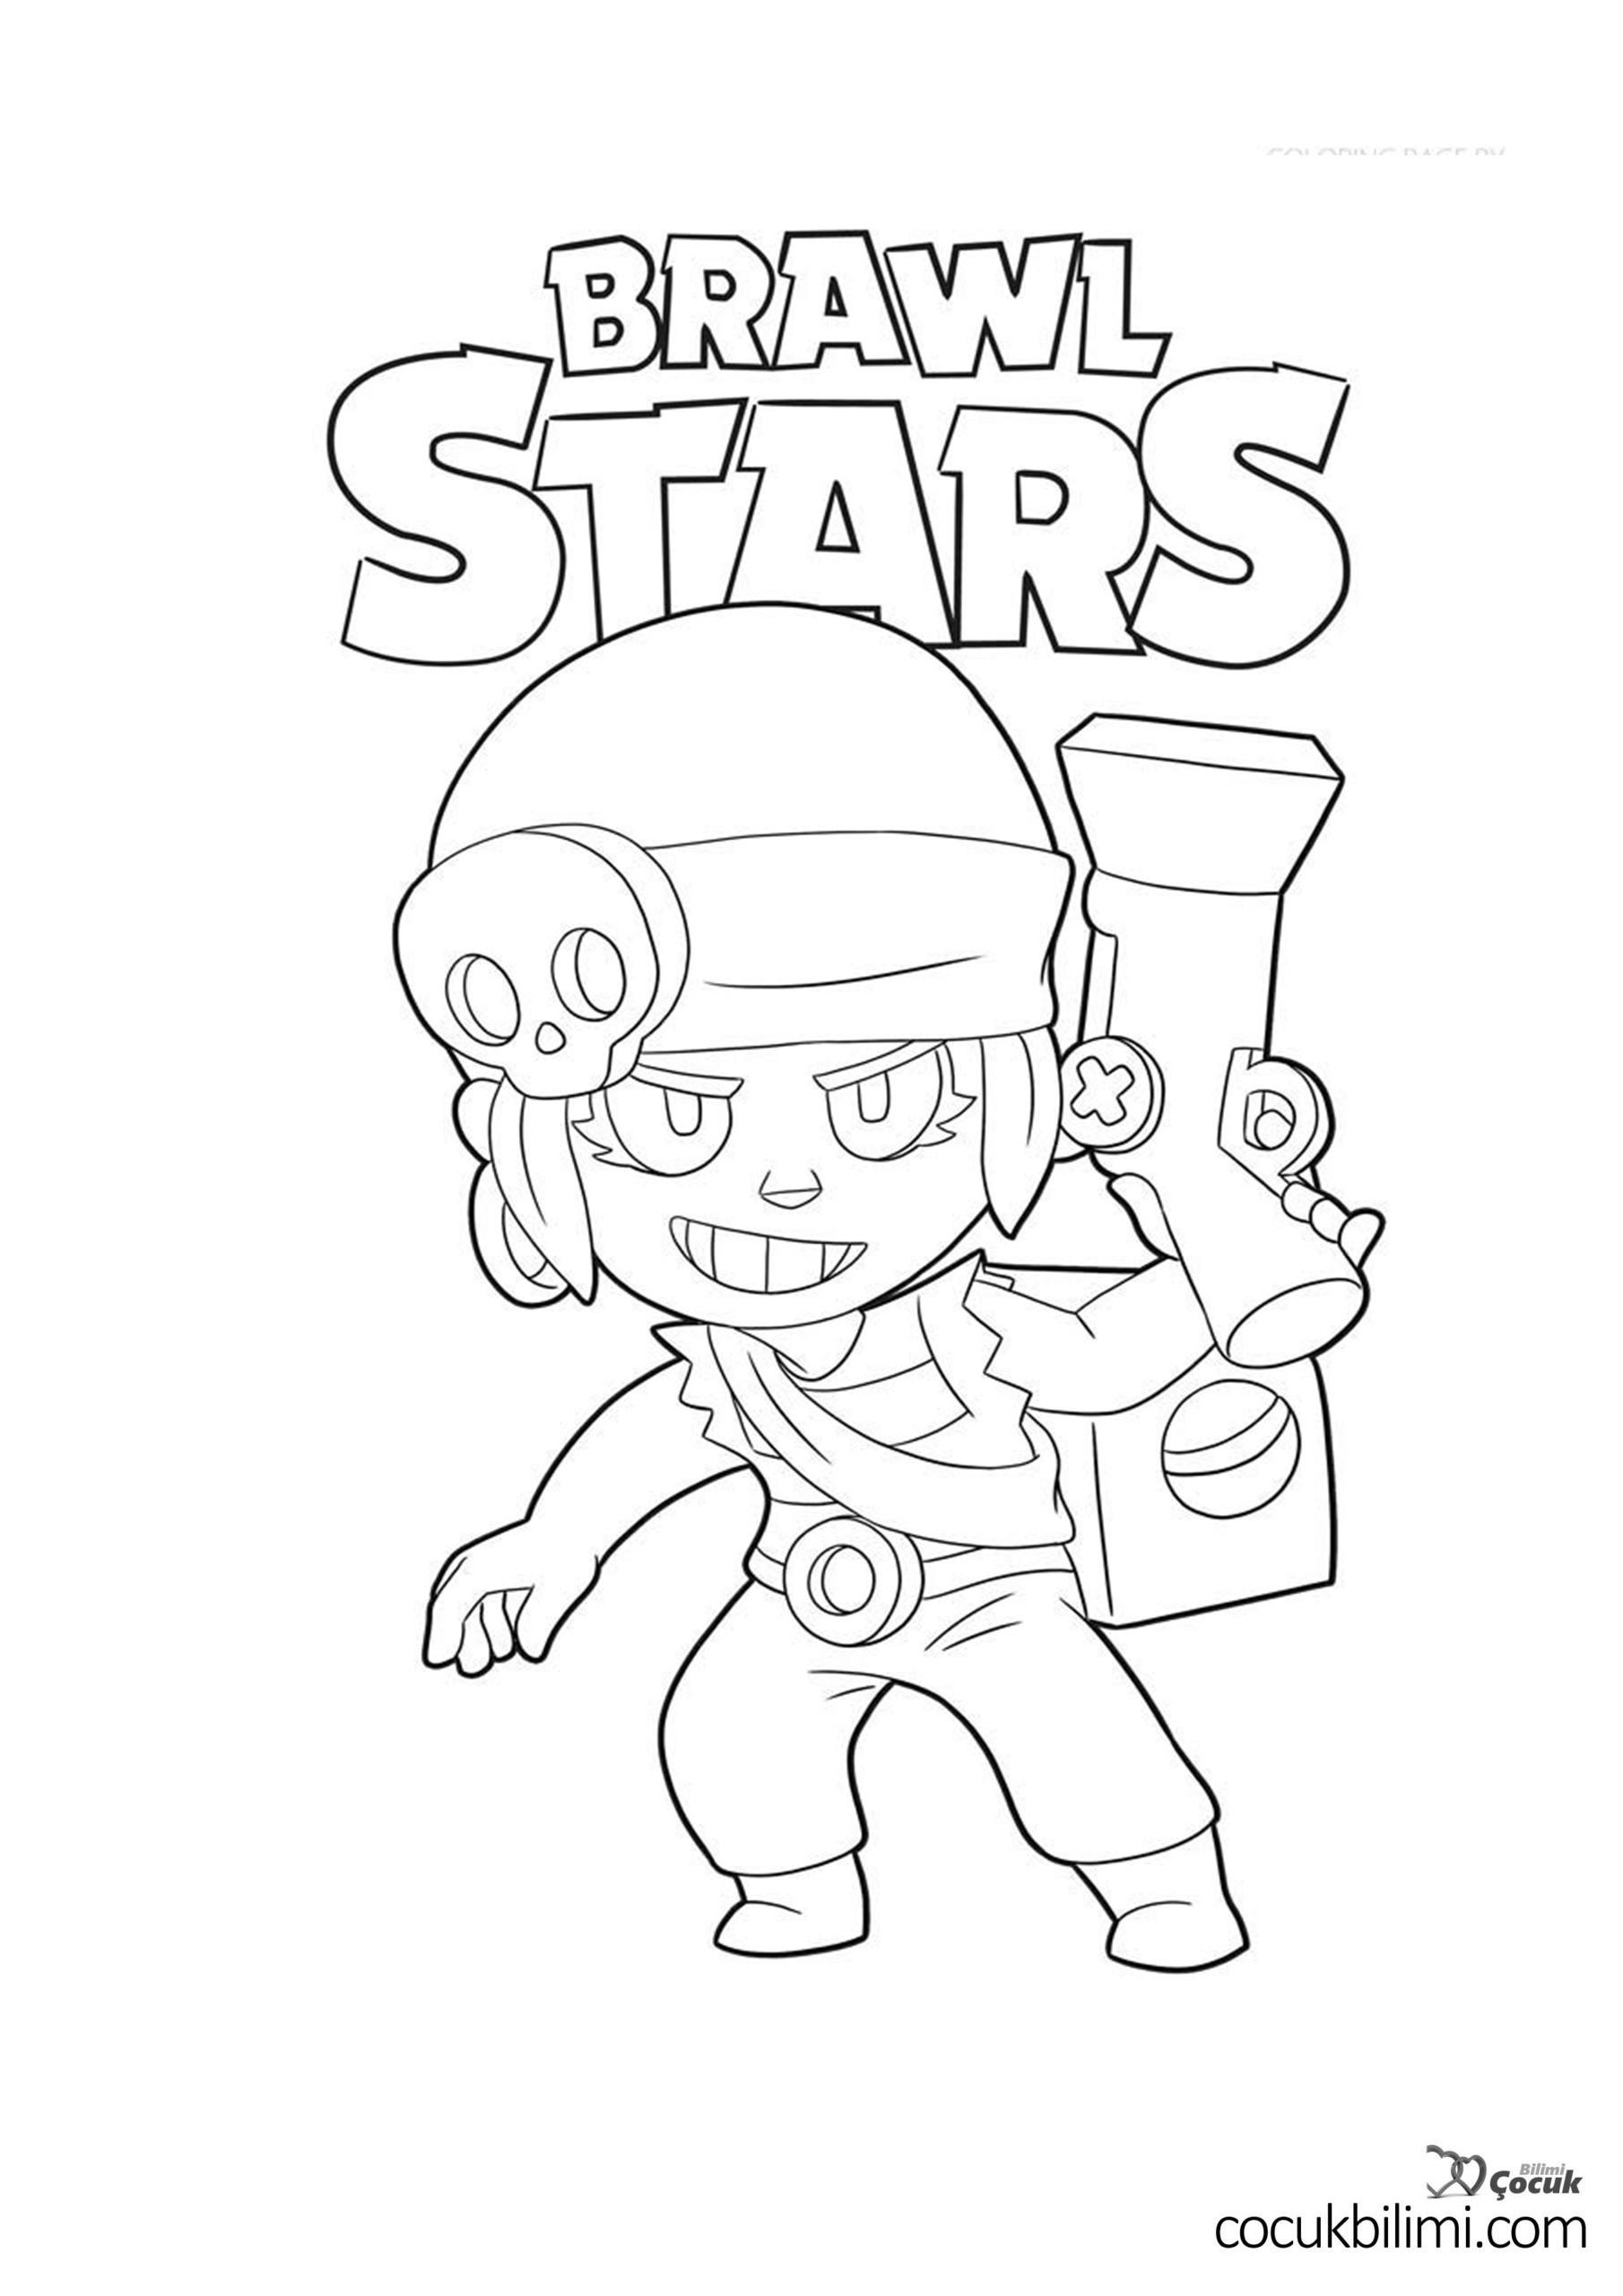 brawl-stars-boyama